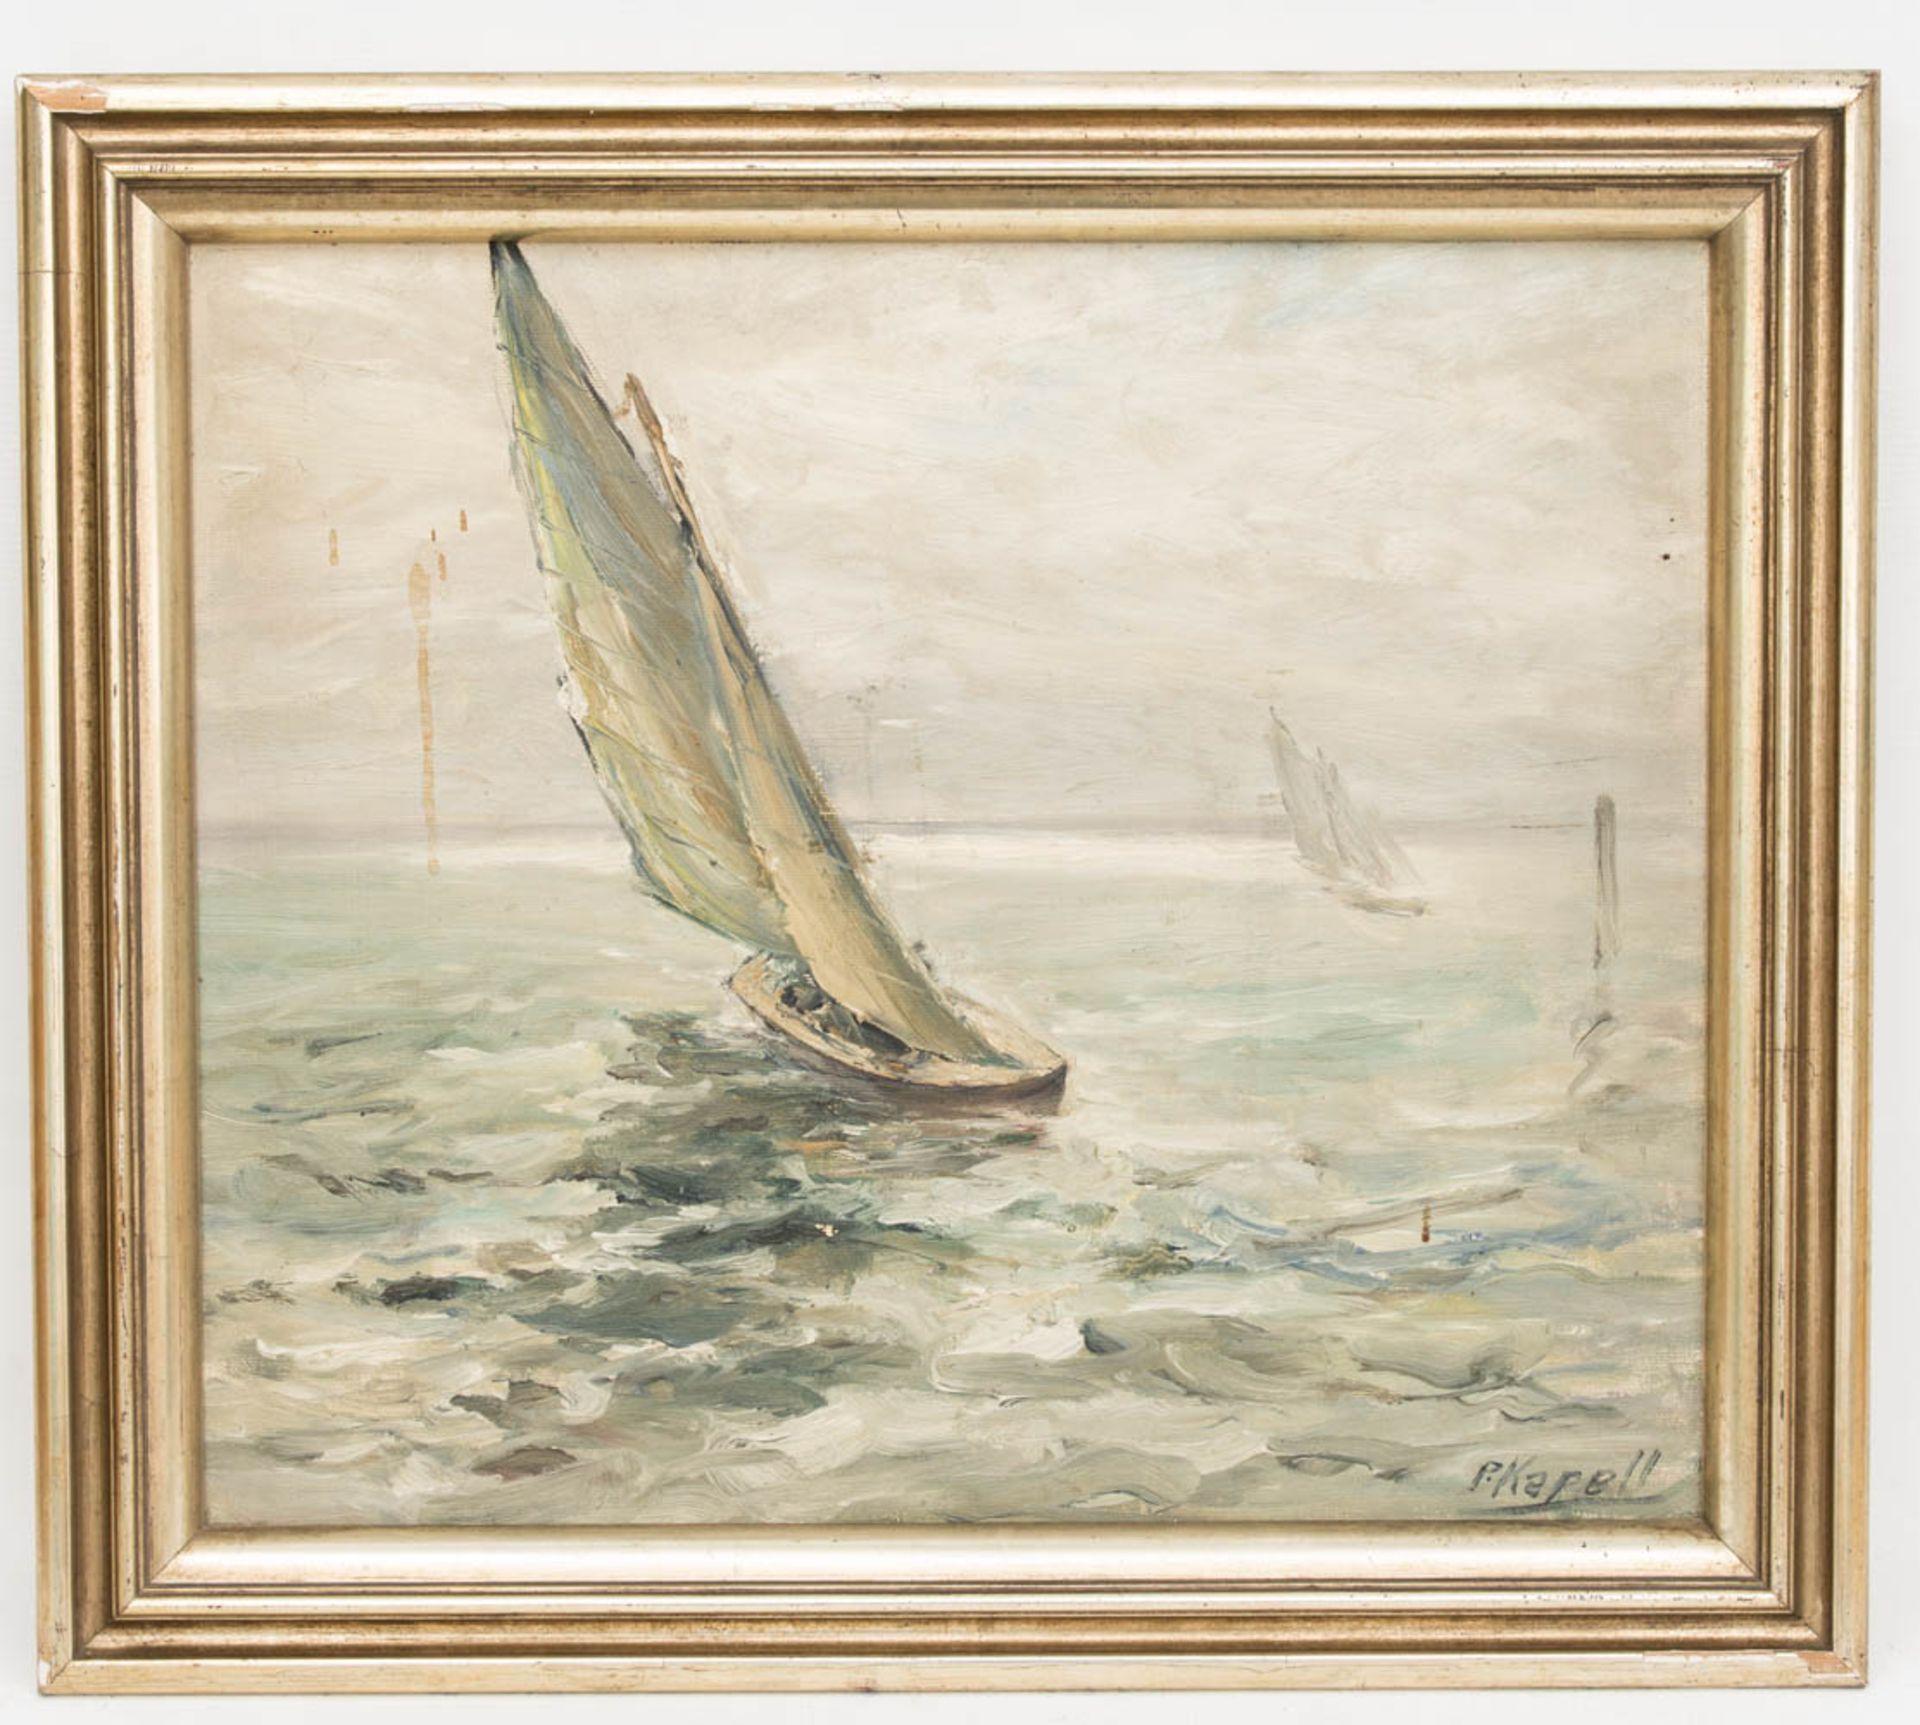 Paul Kapell, Segelboot, Öl auf Karton, 19./20. Jh.Landschaftsansicht, Segelboot im Wi